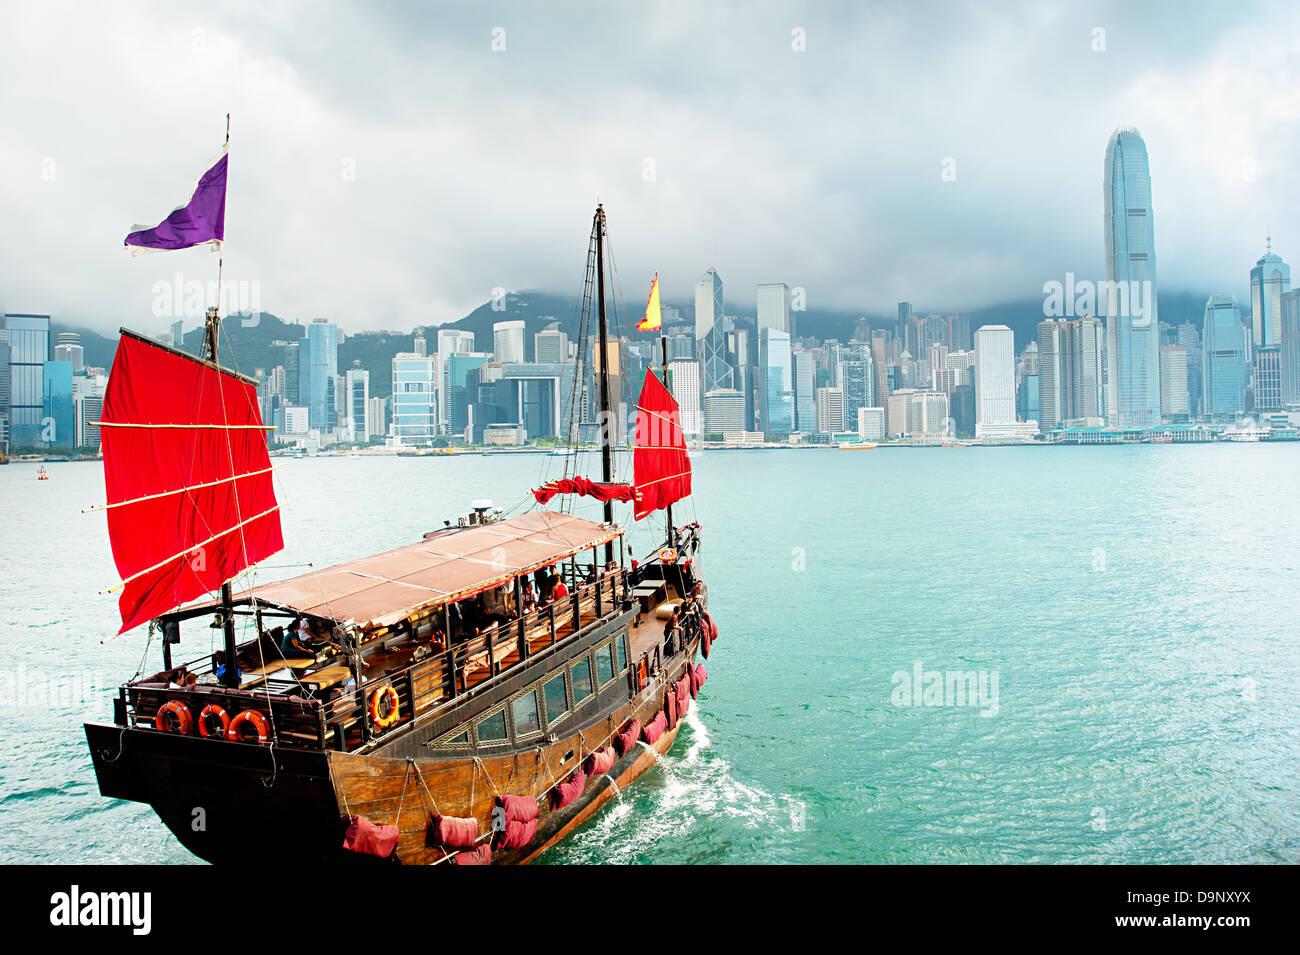 Velero de estilo chino tradicional vela en el puerto de Hong Kong Imagen De Stock